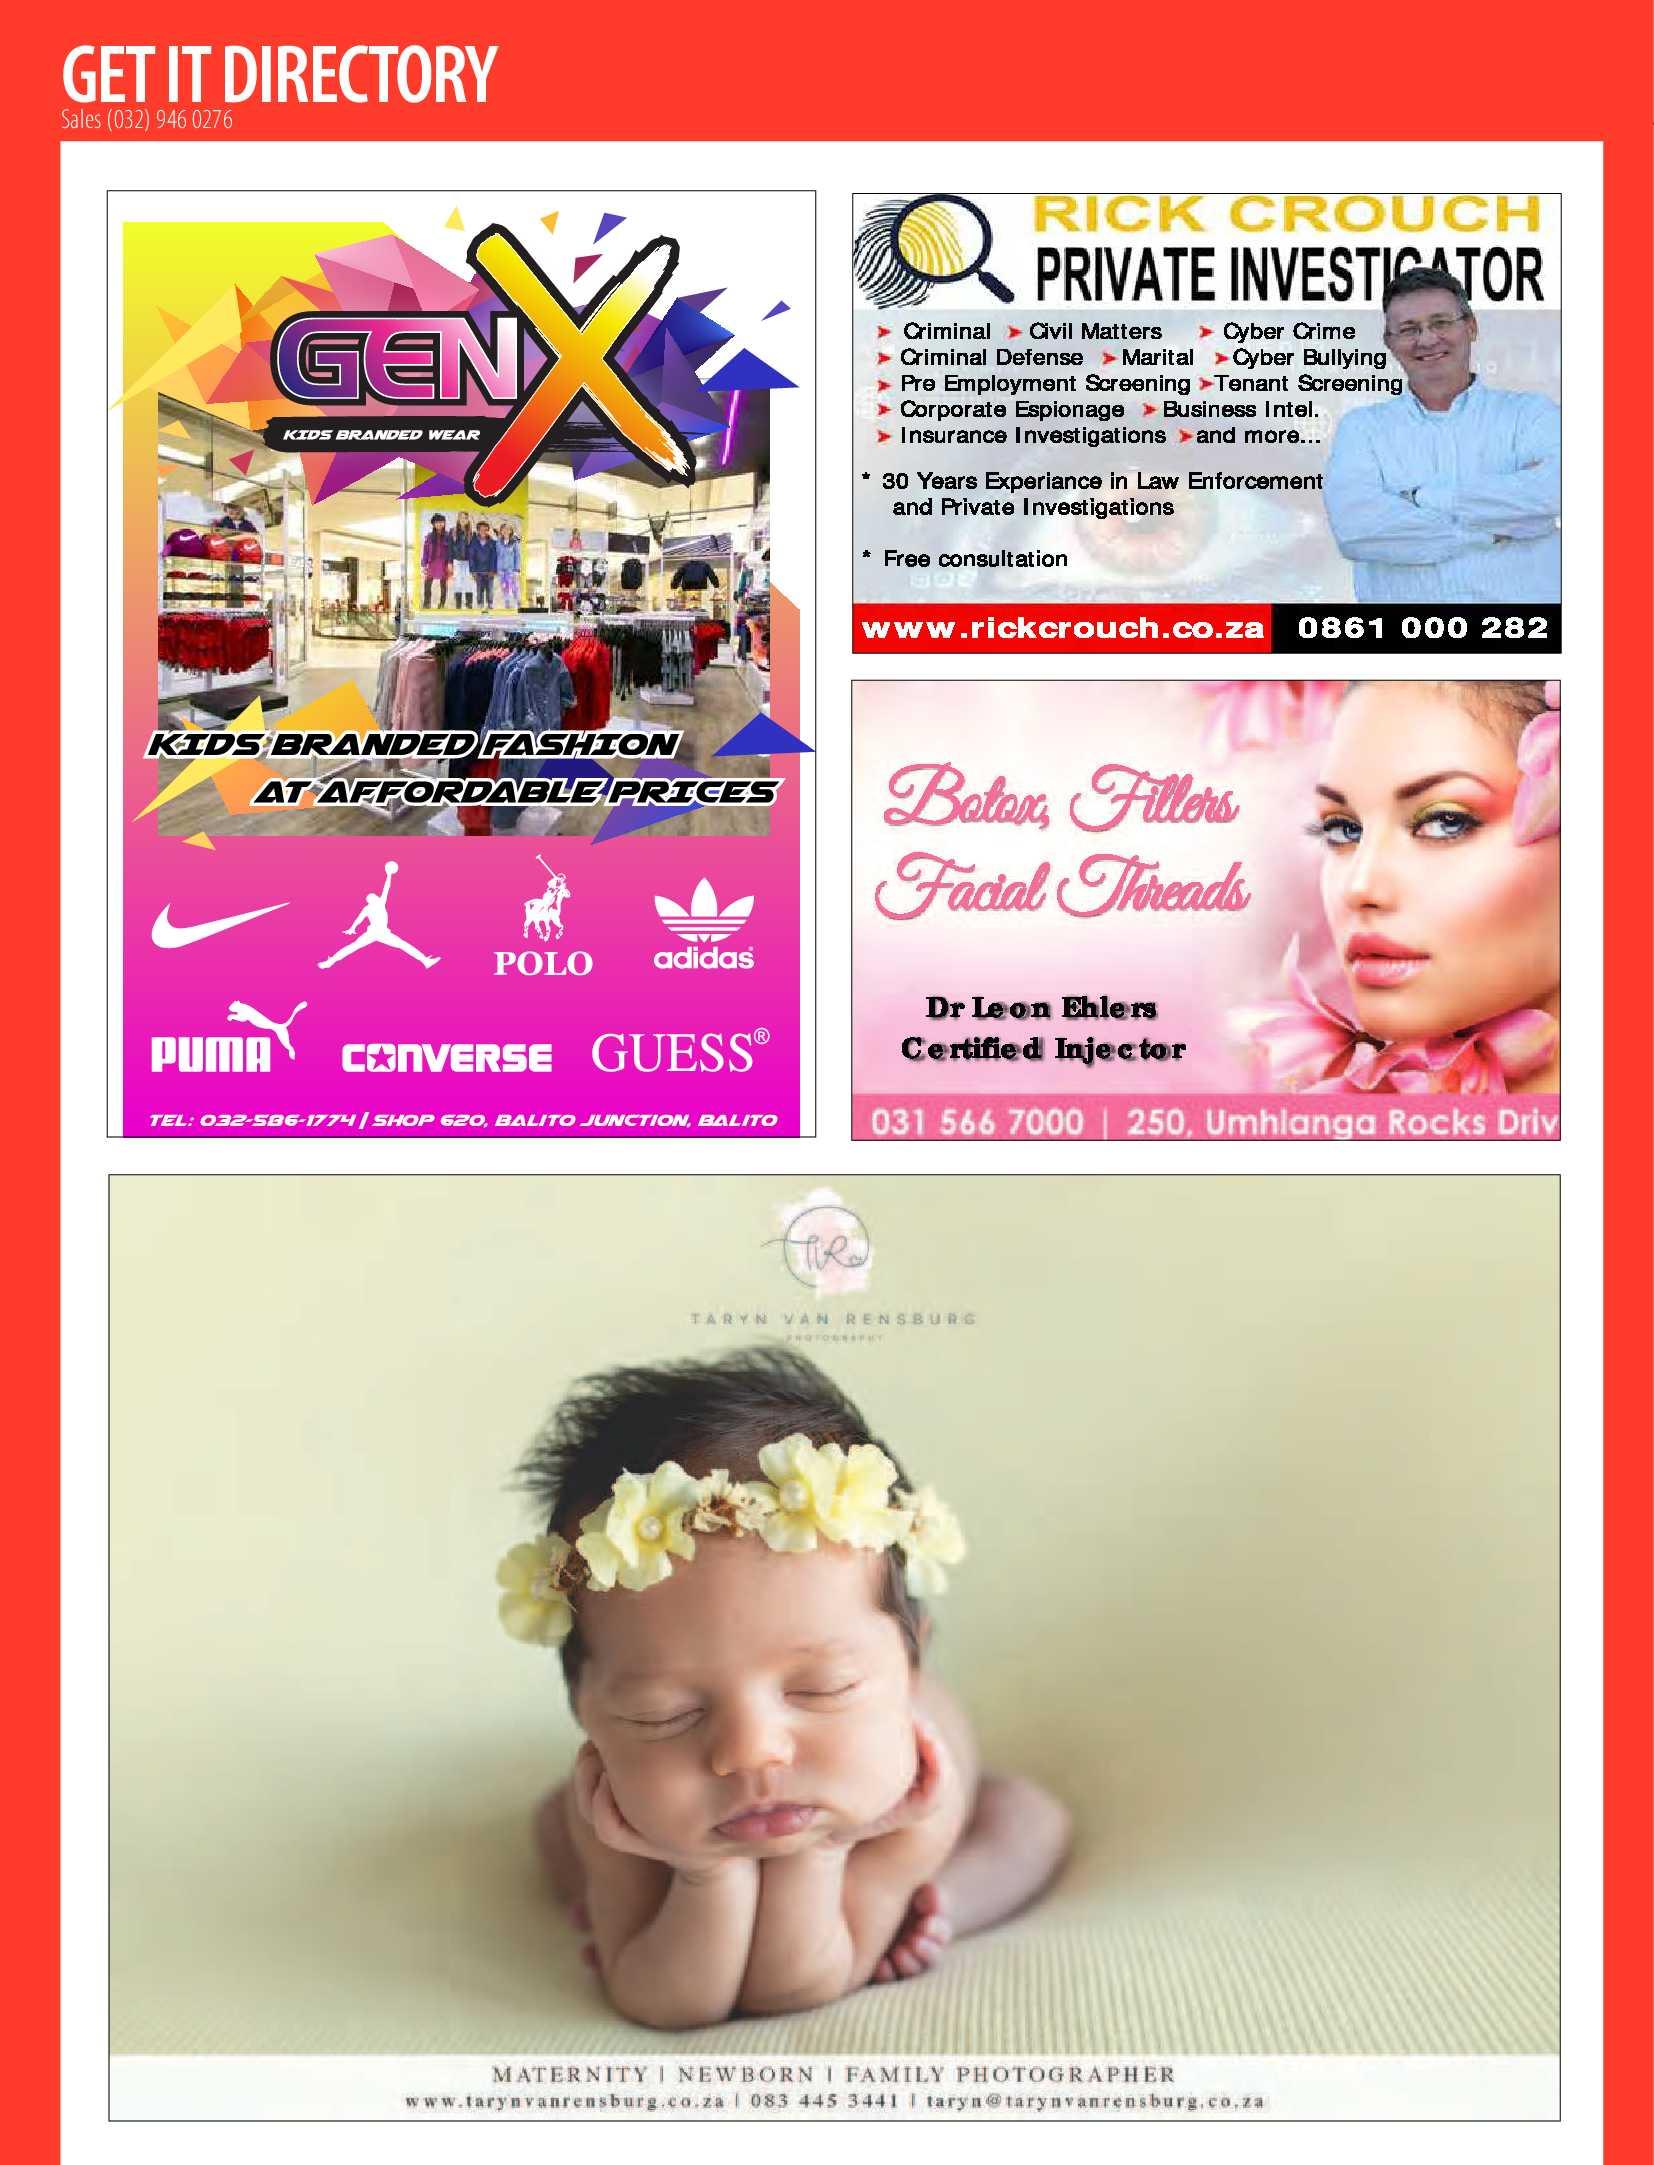 get-magazine-ballitoumhlanga-november-2017-2-epapers-page-62